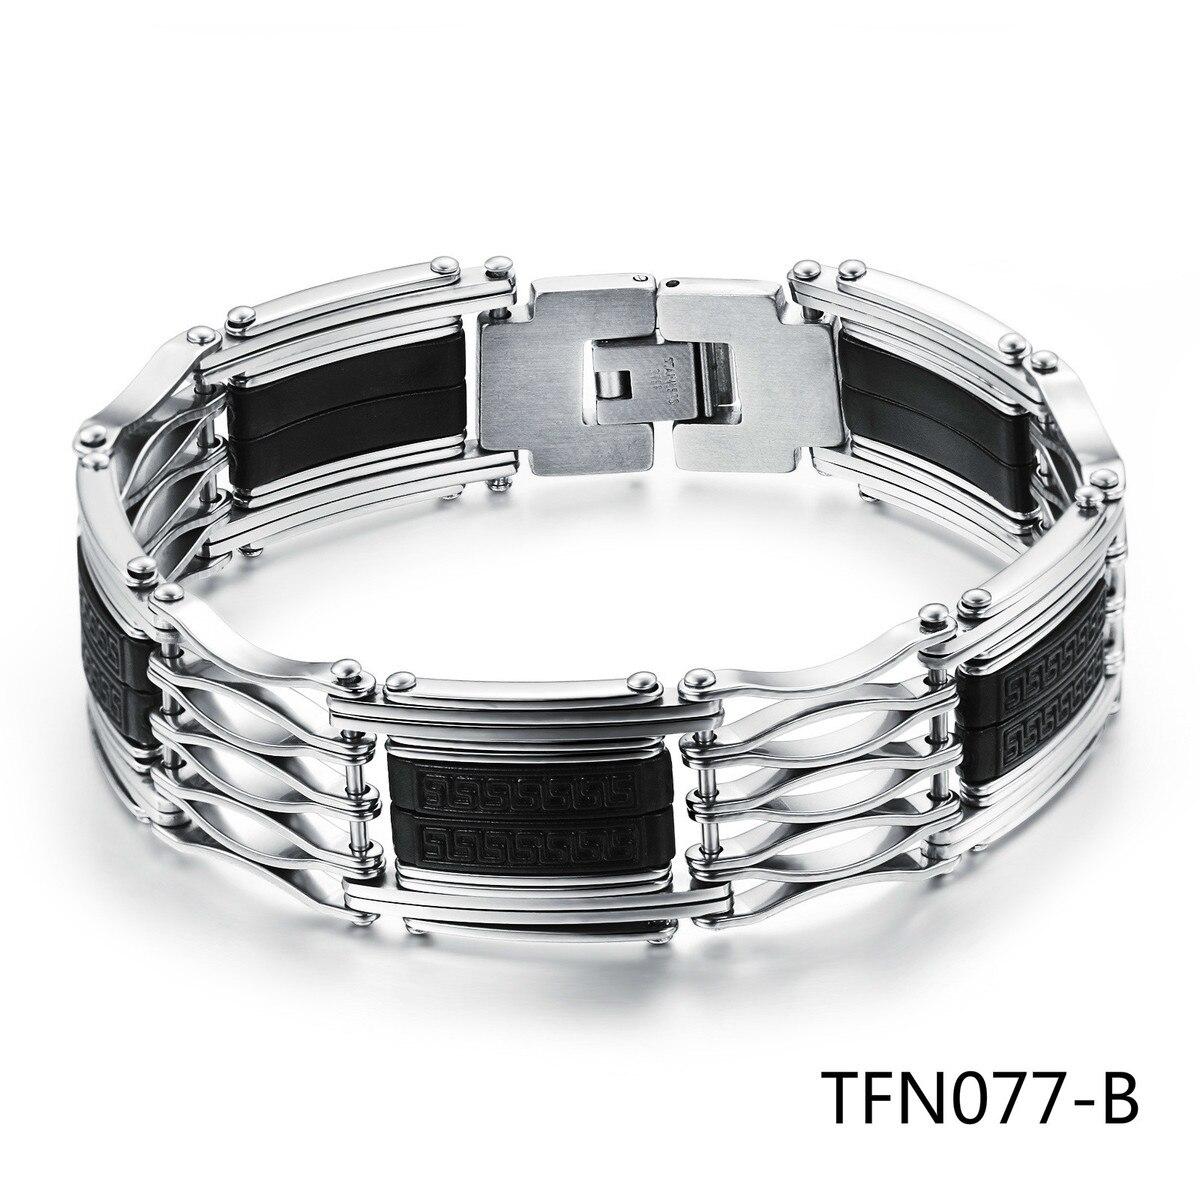 Tide Male Handsome Concise Restore Ancient Ways Fine Silica Gel Bracelet Man Bracelet Exceed Big Face Width PH935